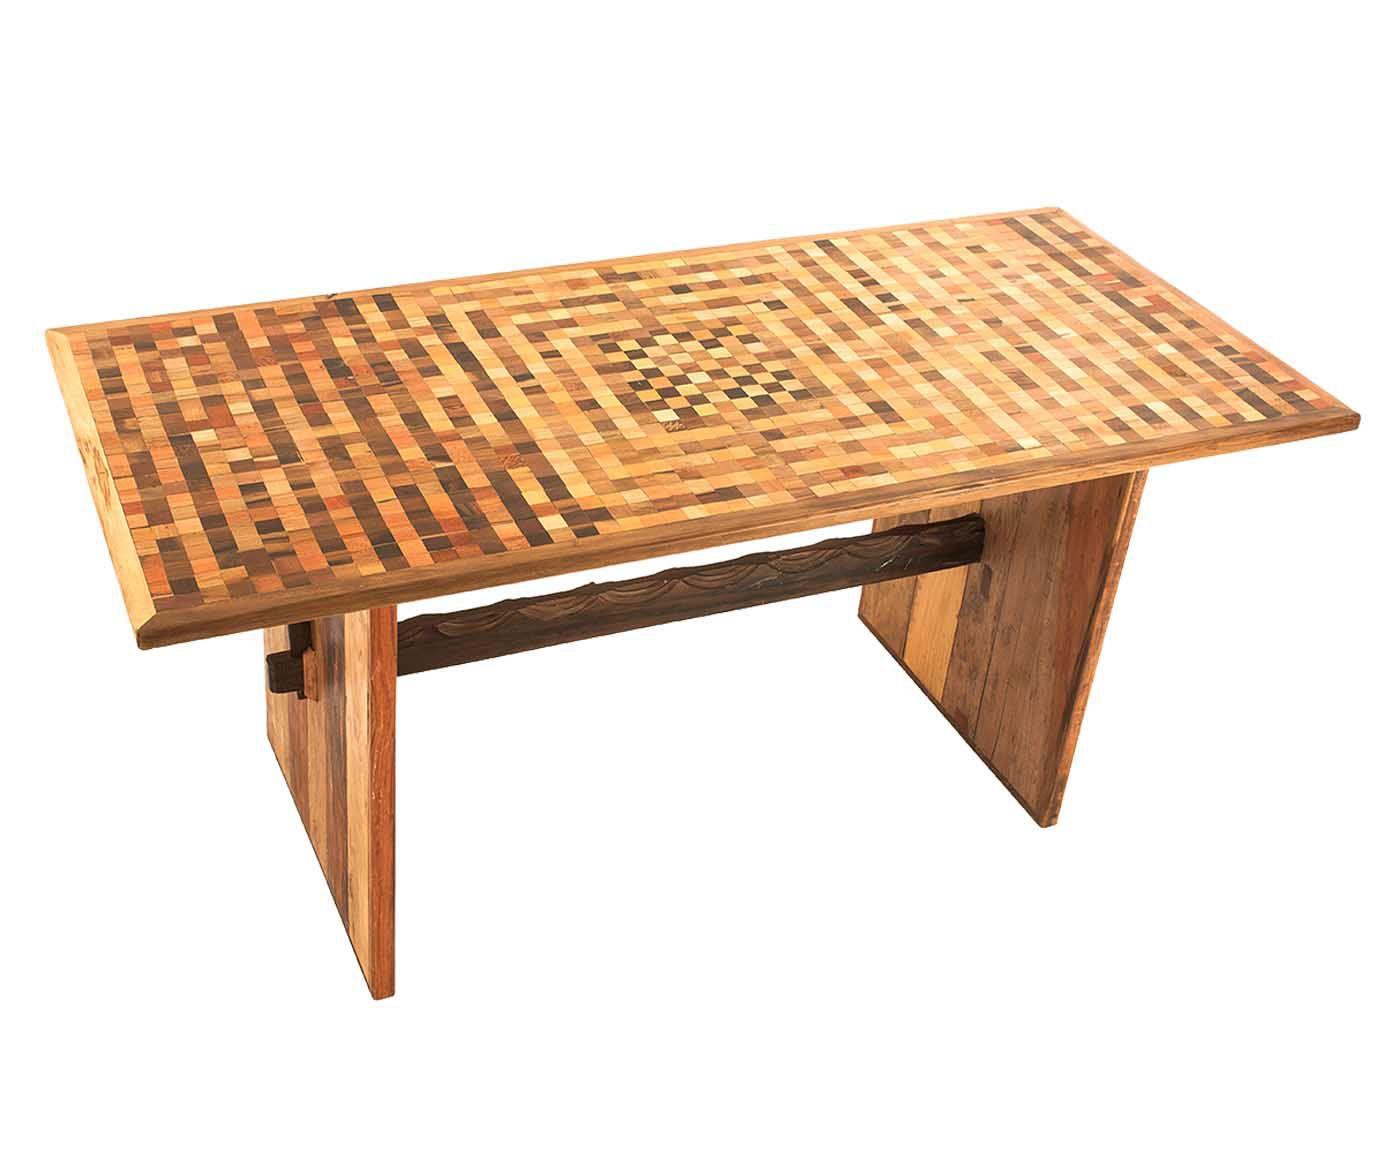 Mesa maia rustic | Westwing.com.br